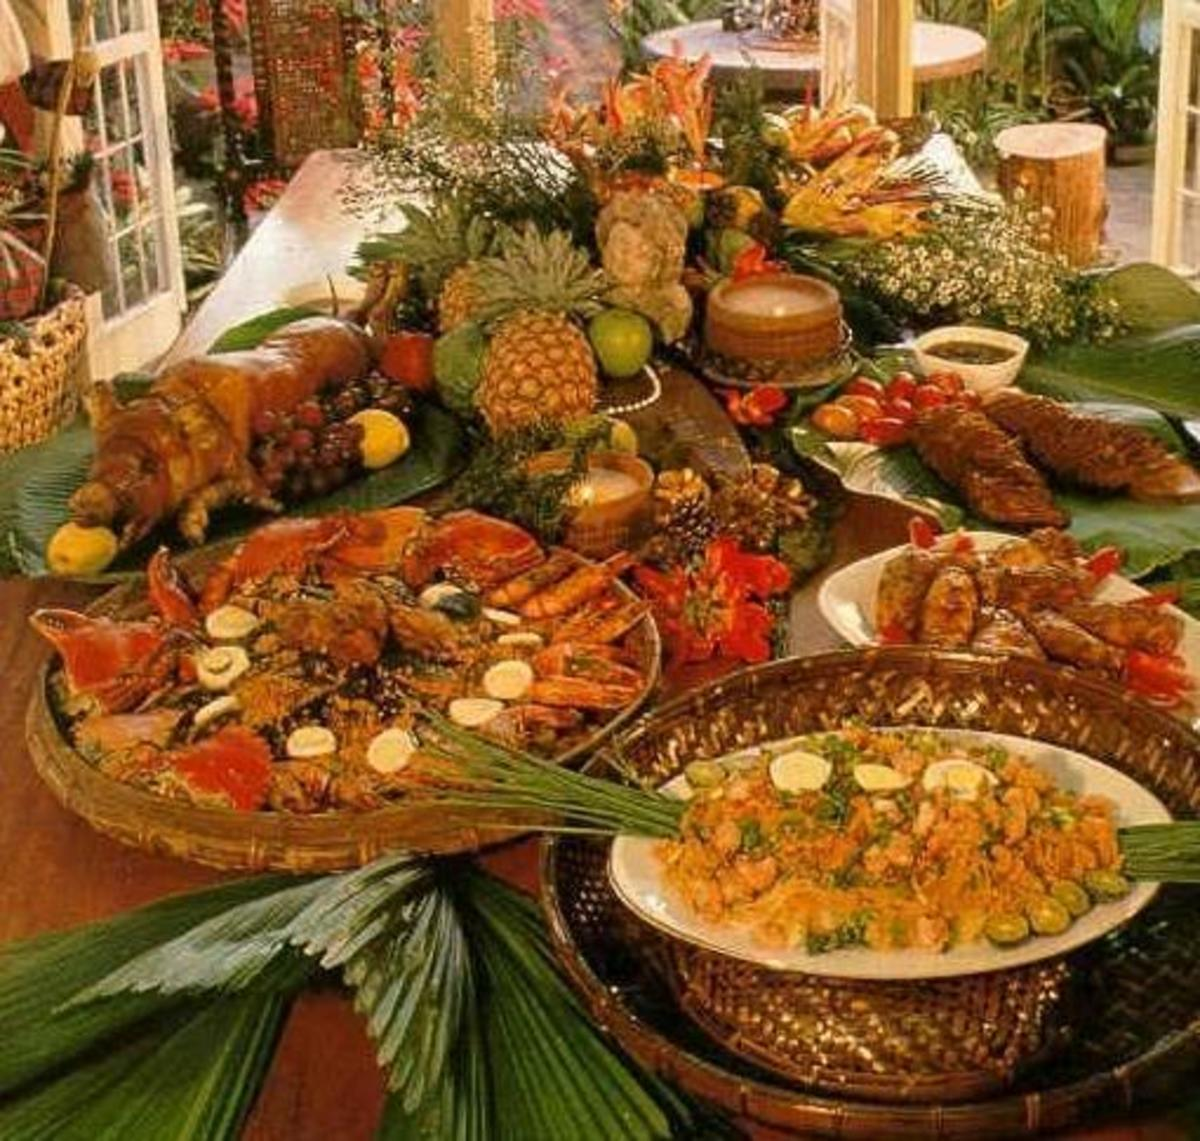 Filipino food fiesta.. hmmm delicious!